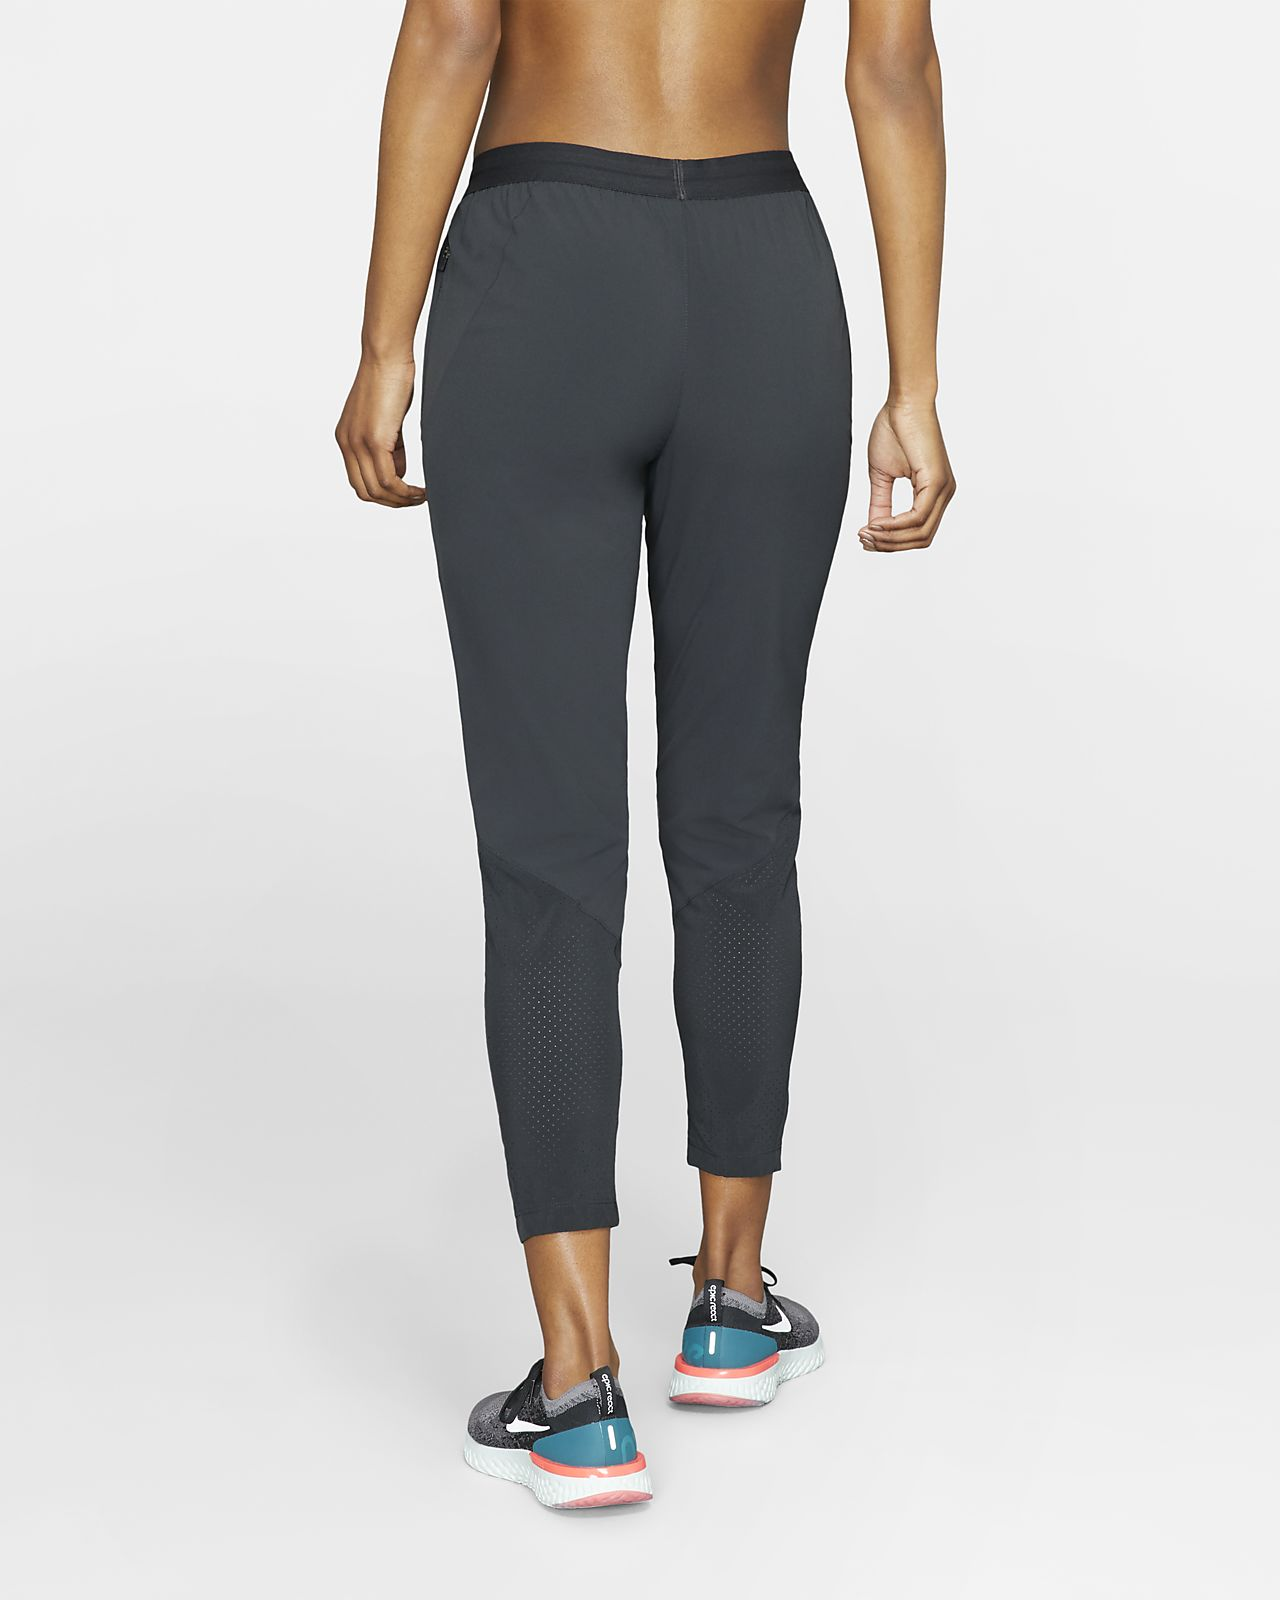 66e8f9352c7 Nike Essential Women s 7 8 Running Pants. Nike.com